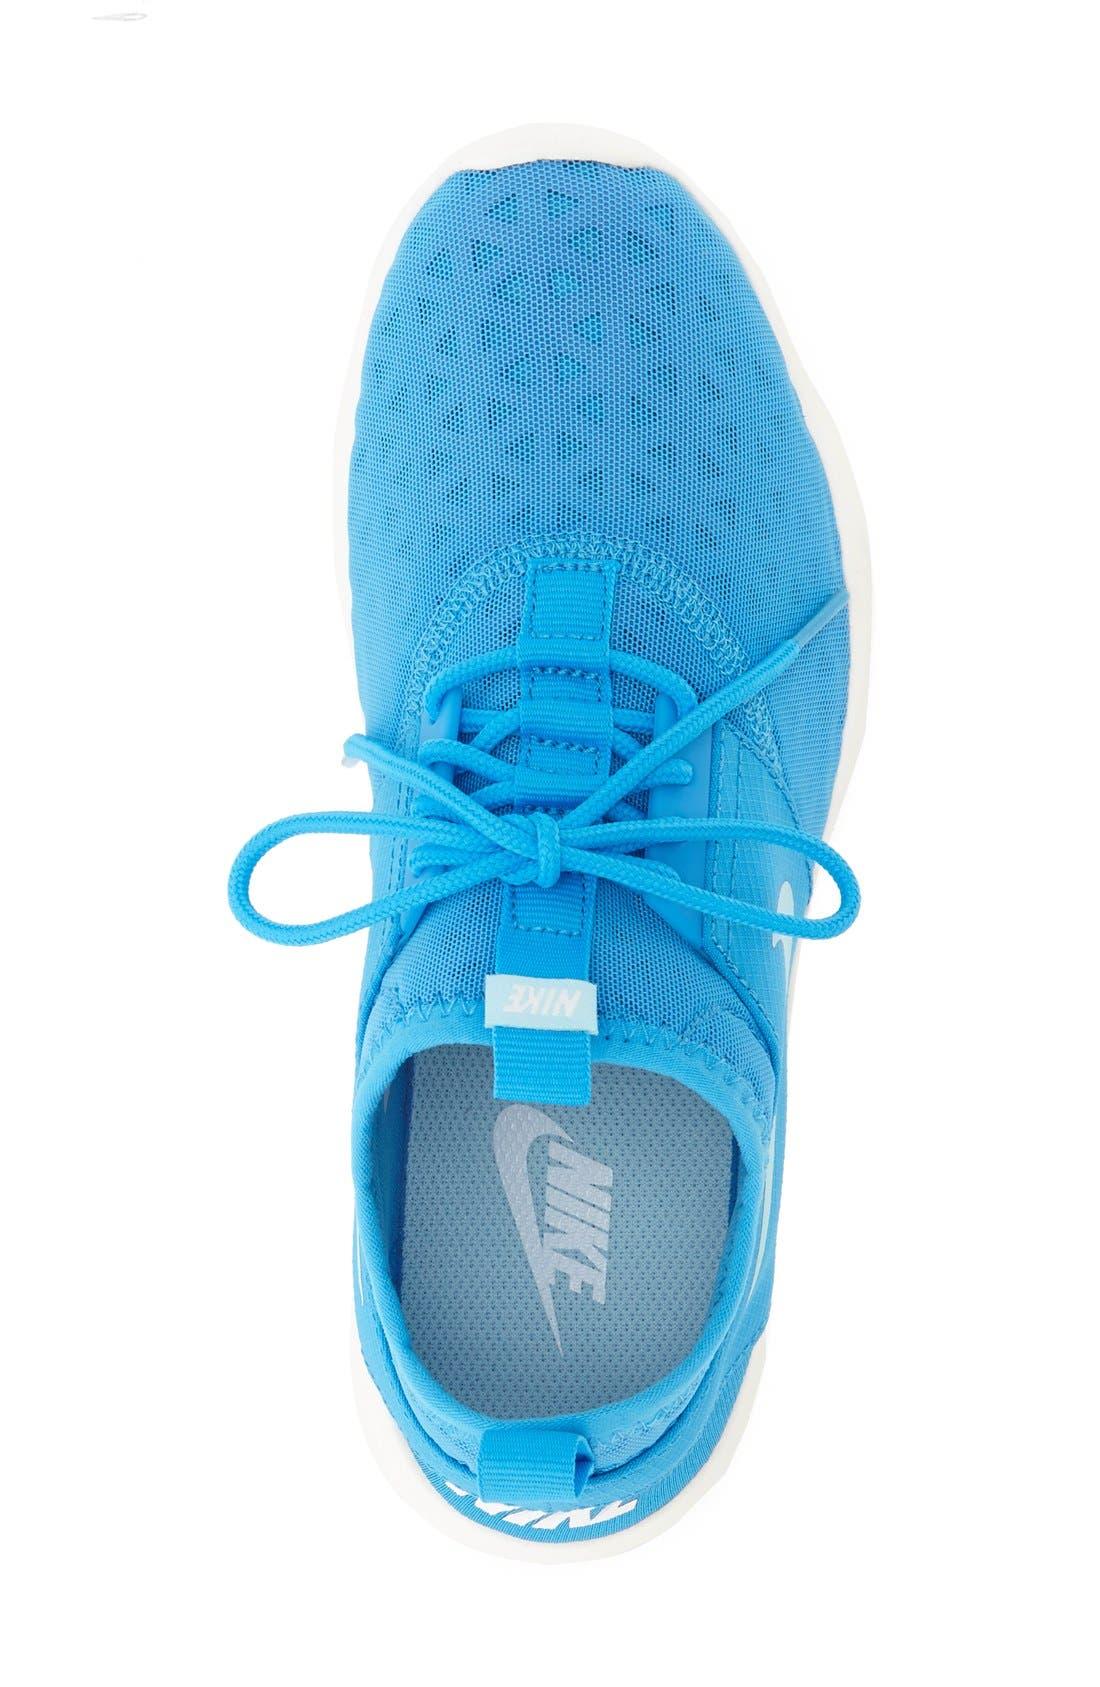 Juvenate Sneaker,                             Alternate thumbnail 151, color,